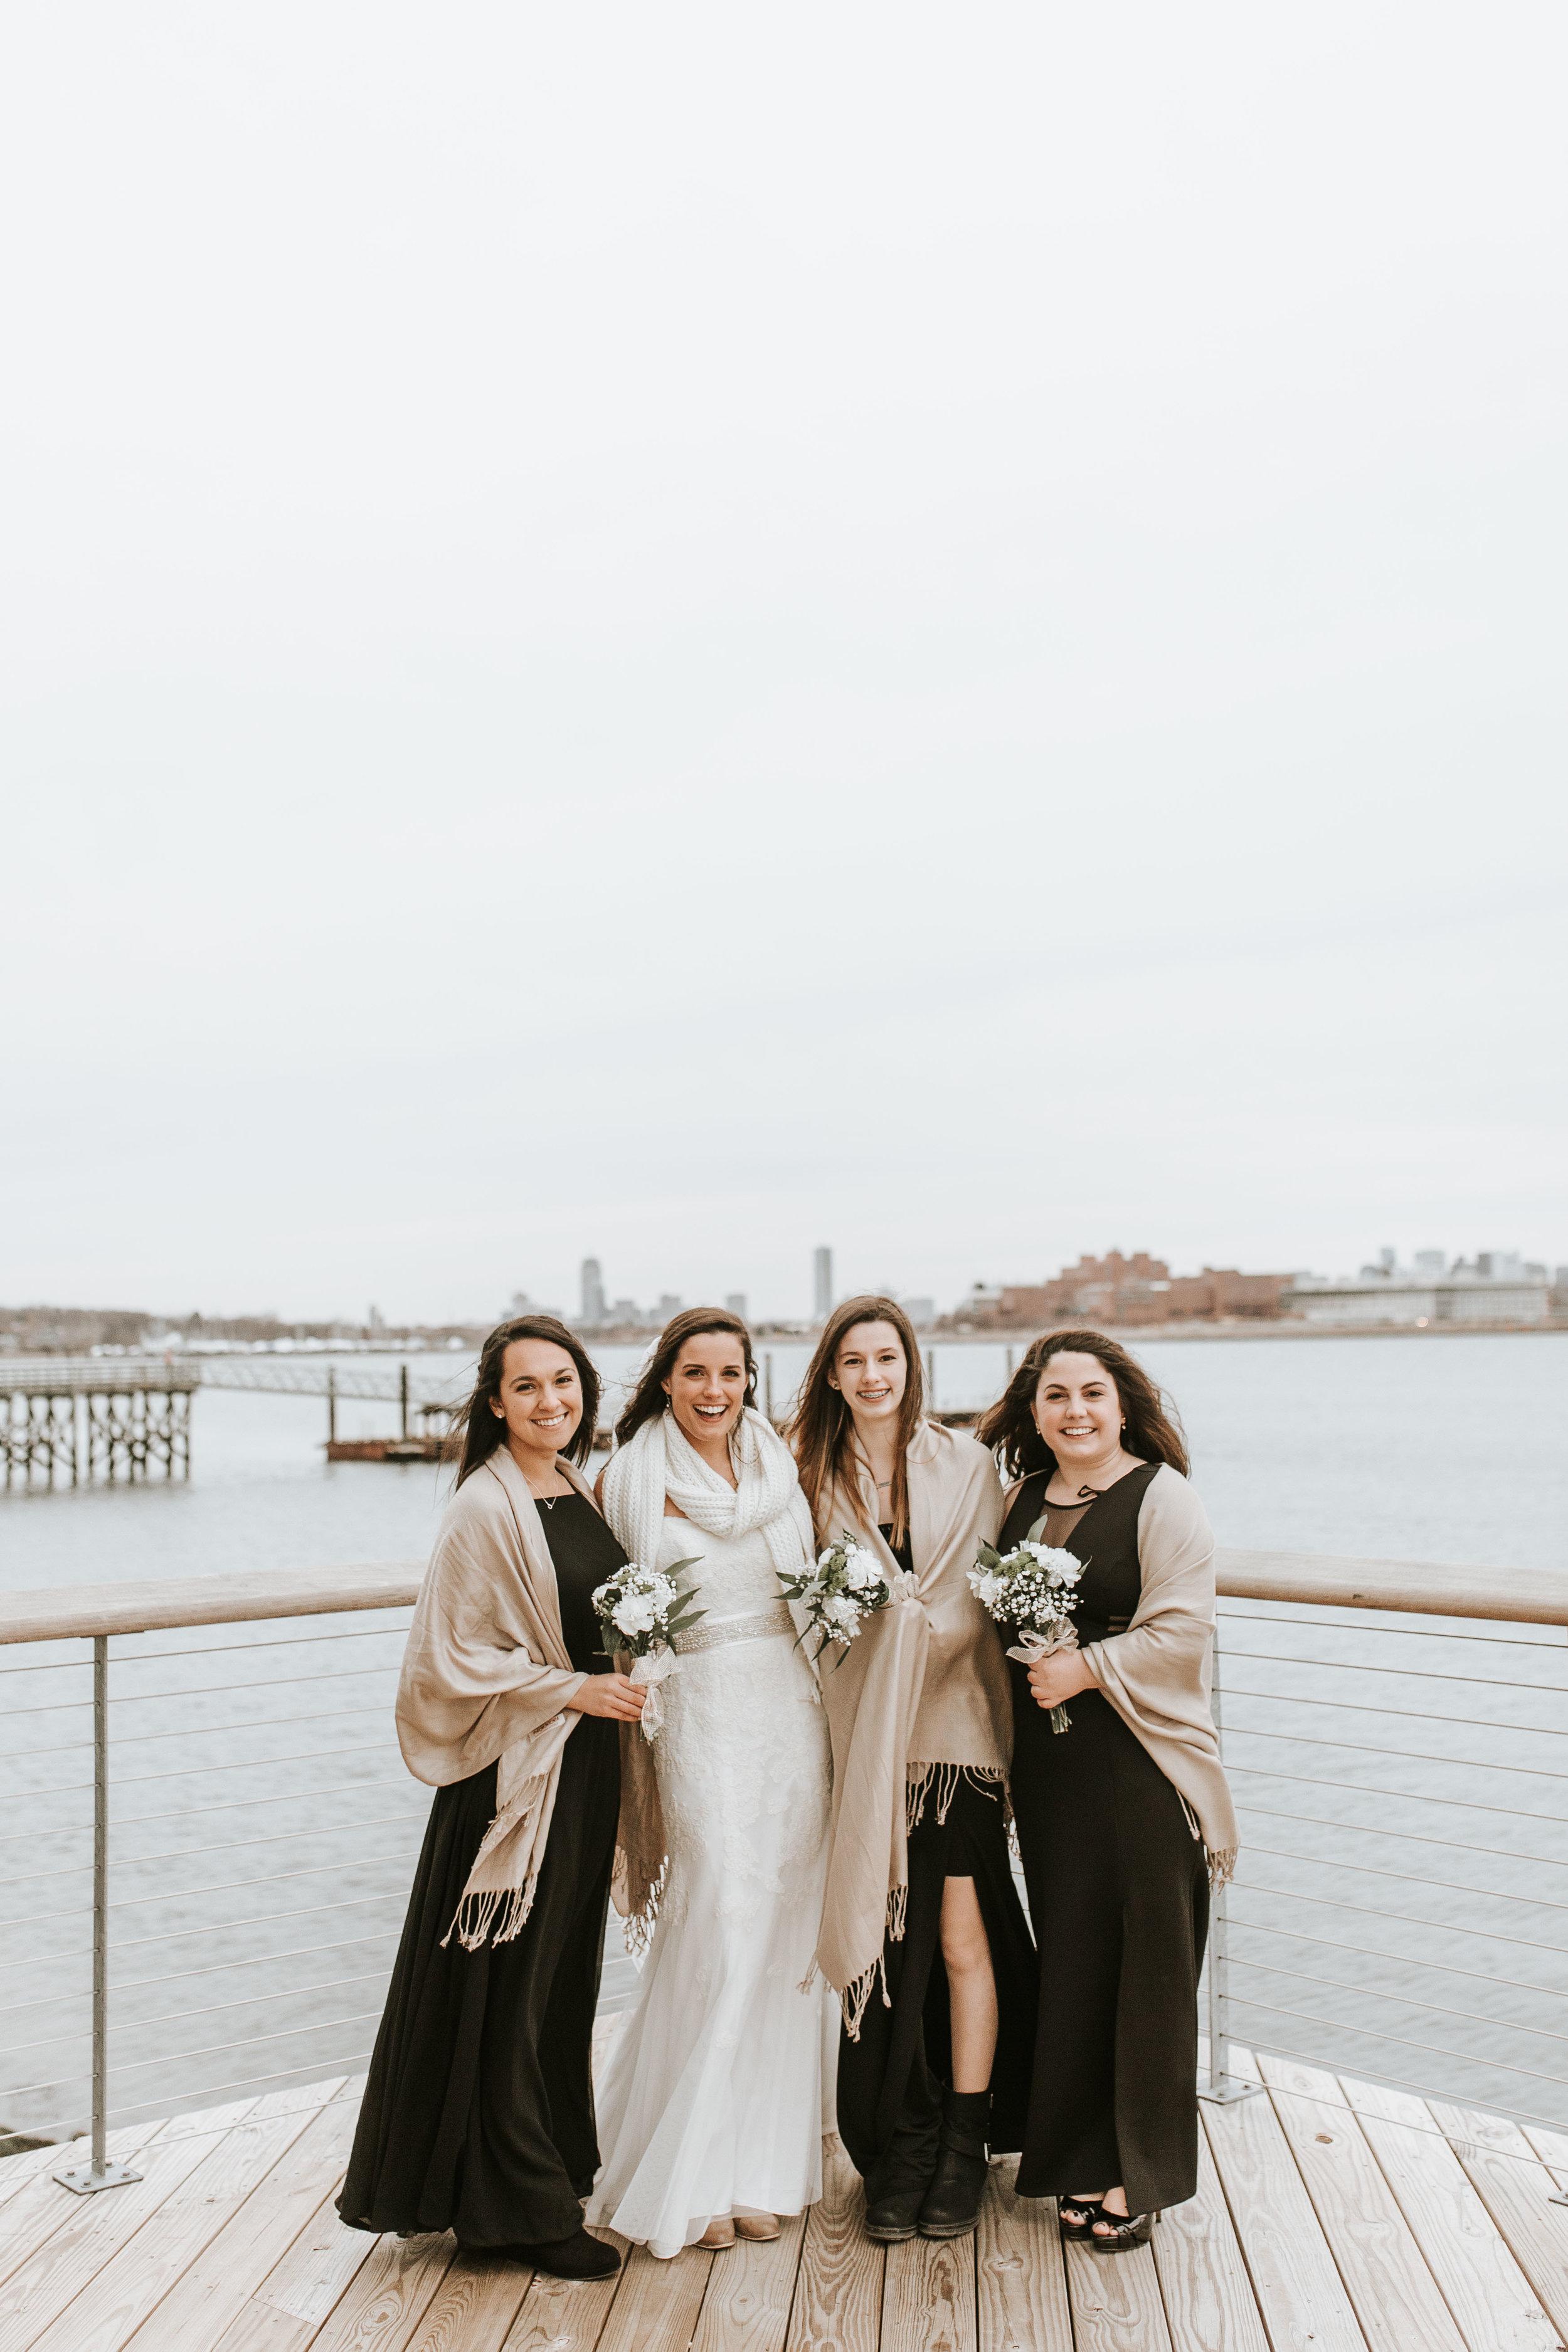 nicole-daacke-photography-boston-massachusetts-seaside-intimate-winter-wedding-photographer-27.jpg